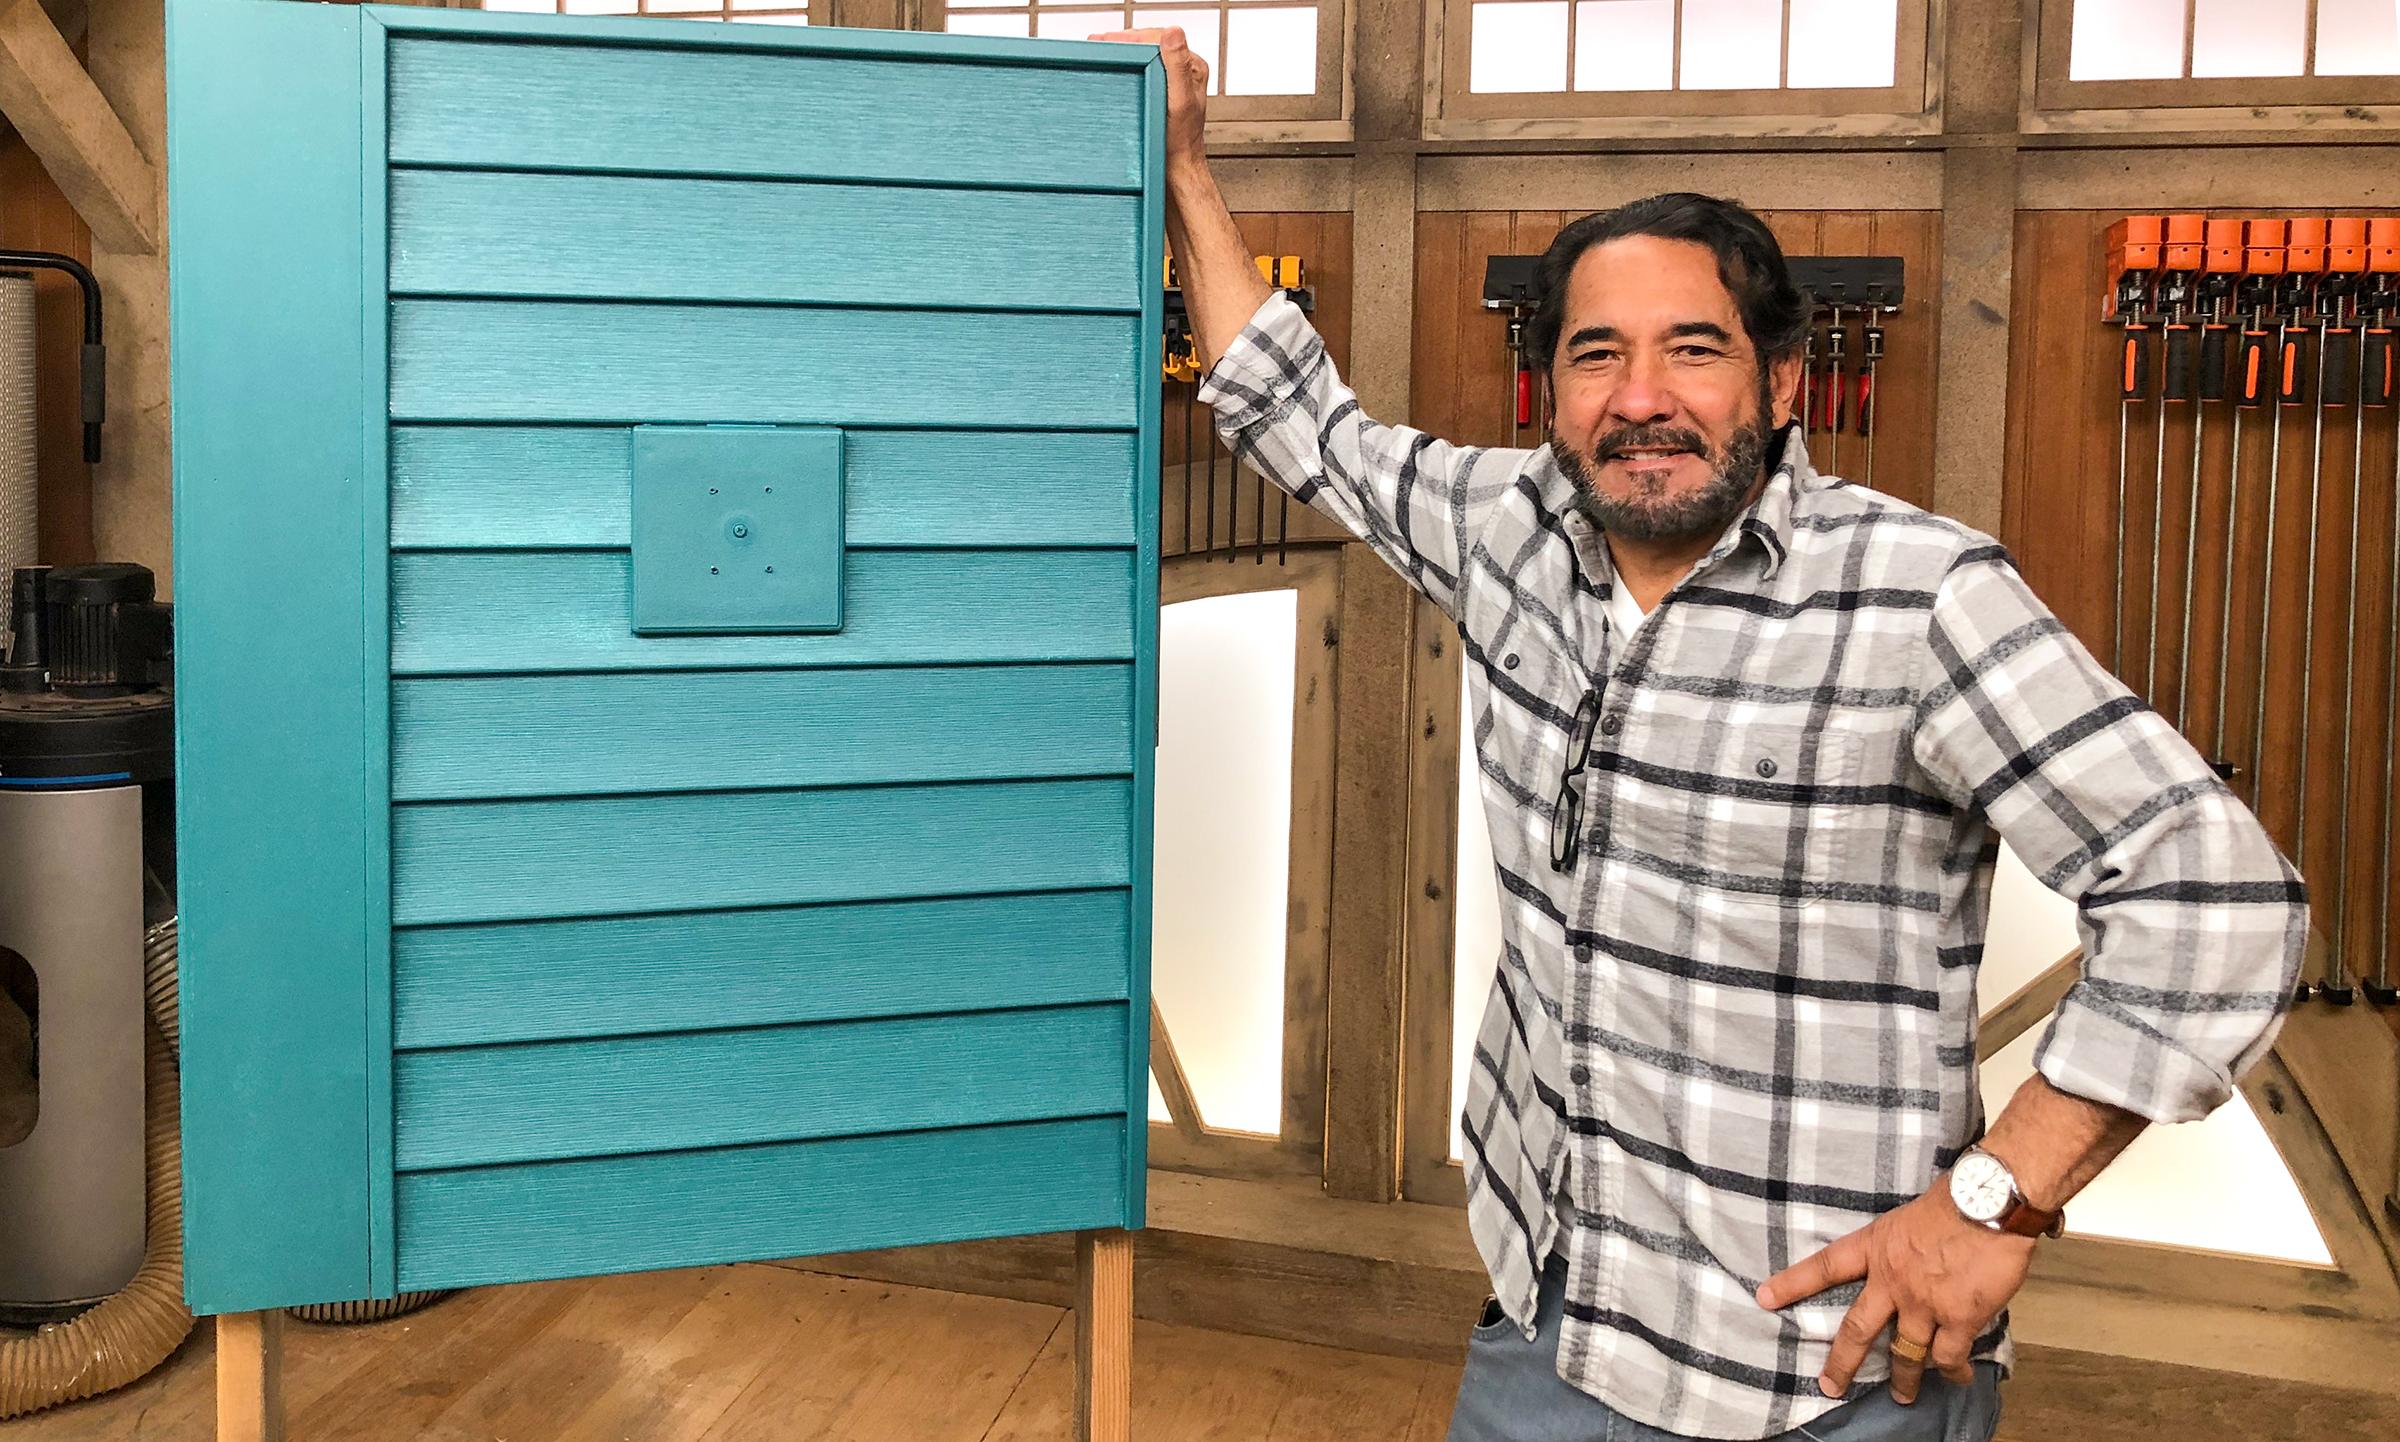 Mauro paints vinyl siding